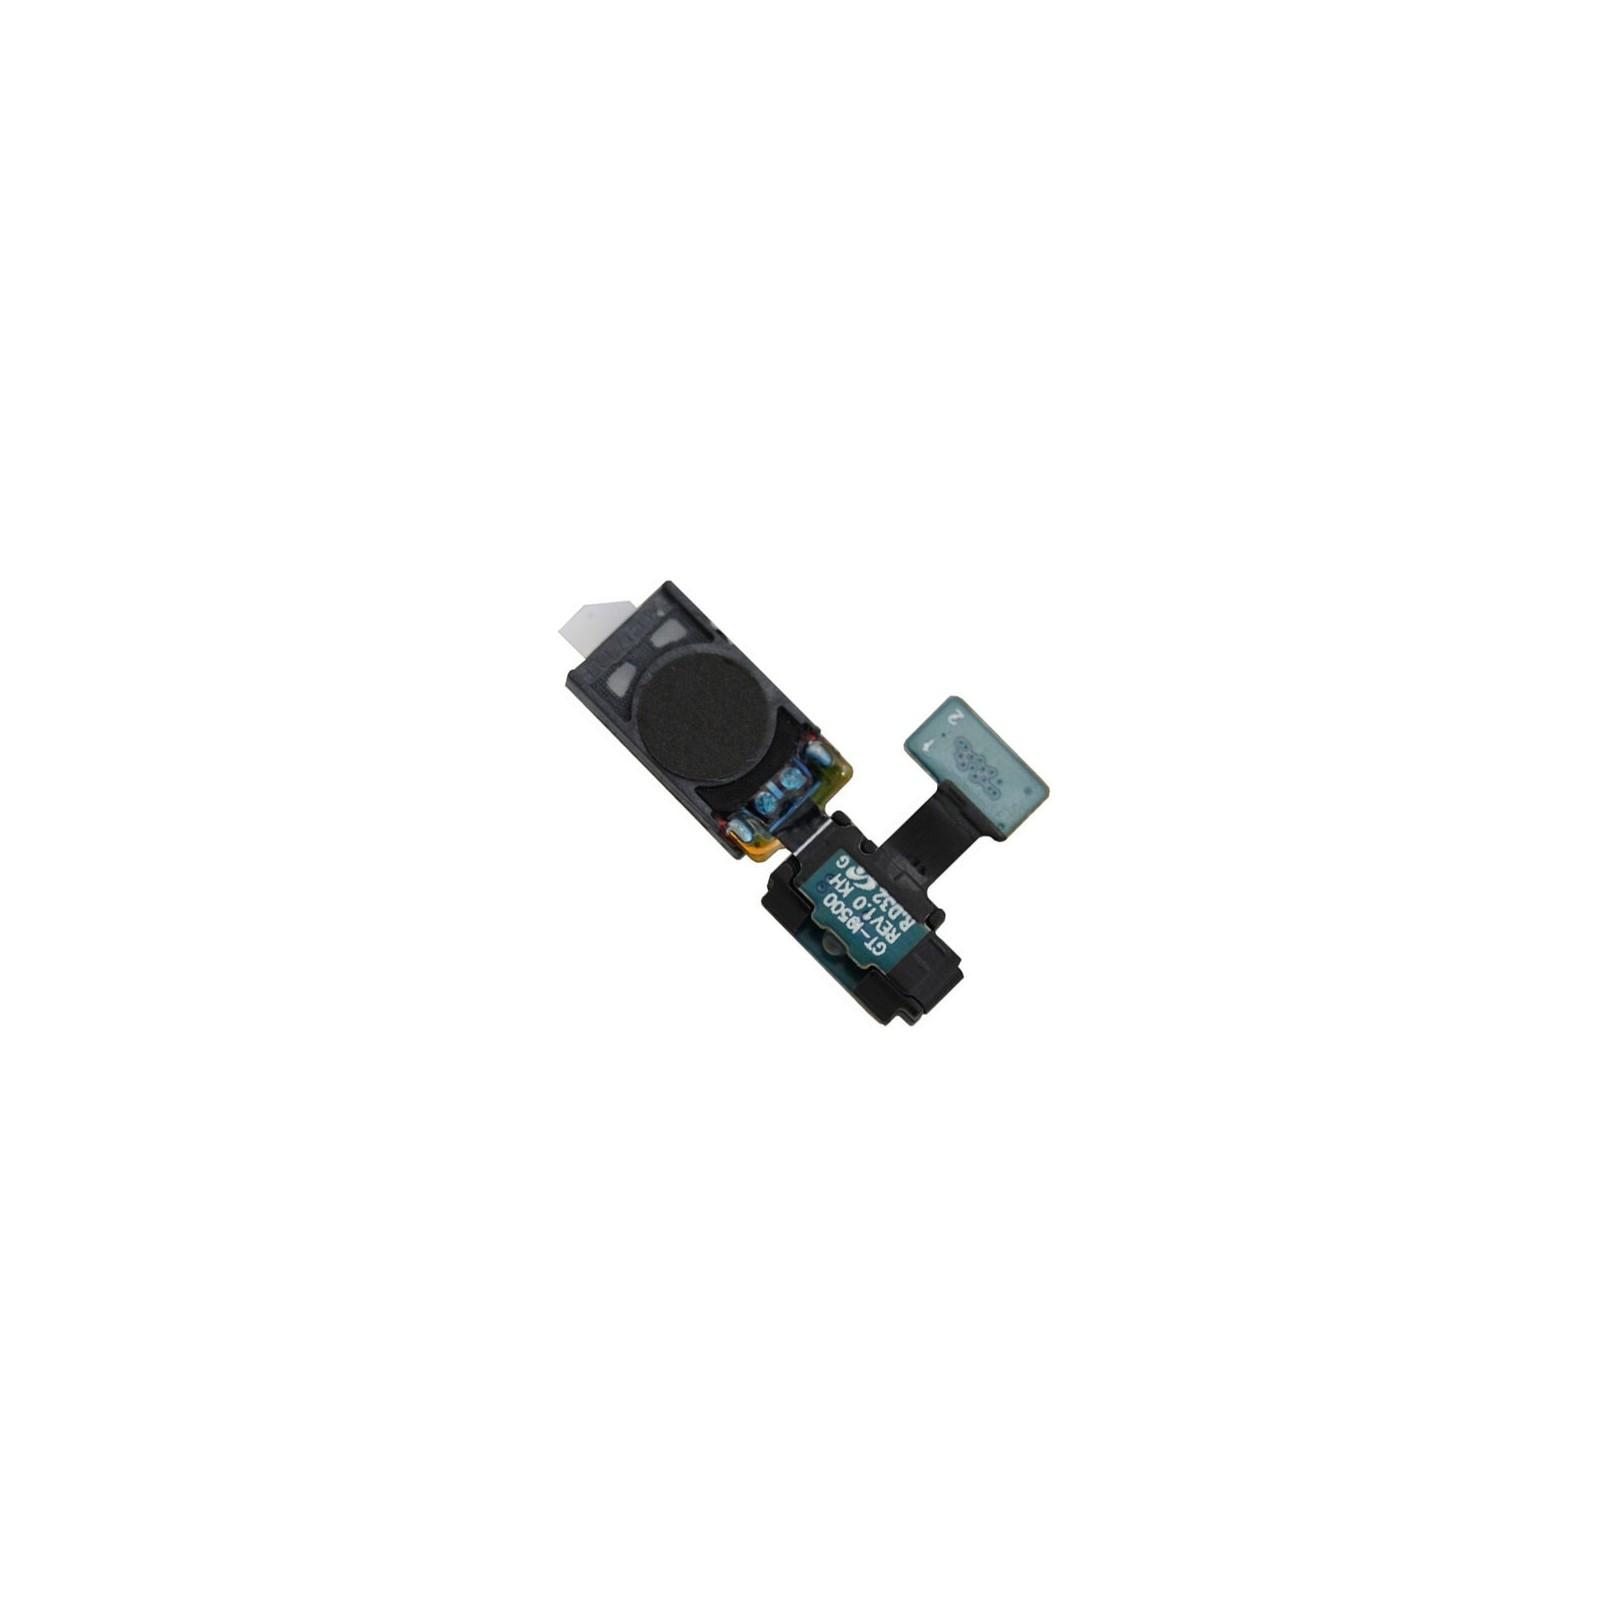 Flex Auricular y Sensor Proximidad para Samsung Galaxy S4 IV i9500 i9505 Samsung - 1